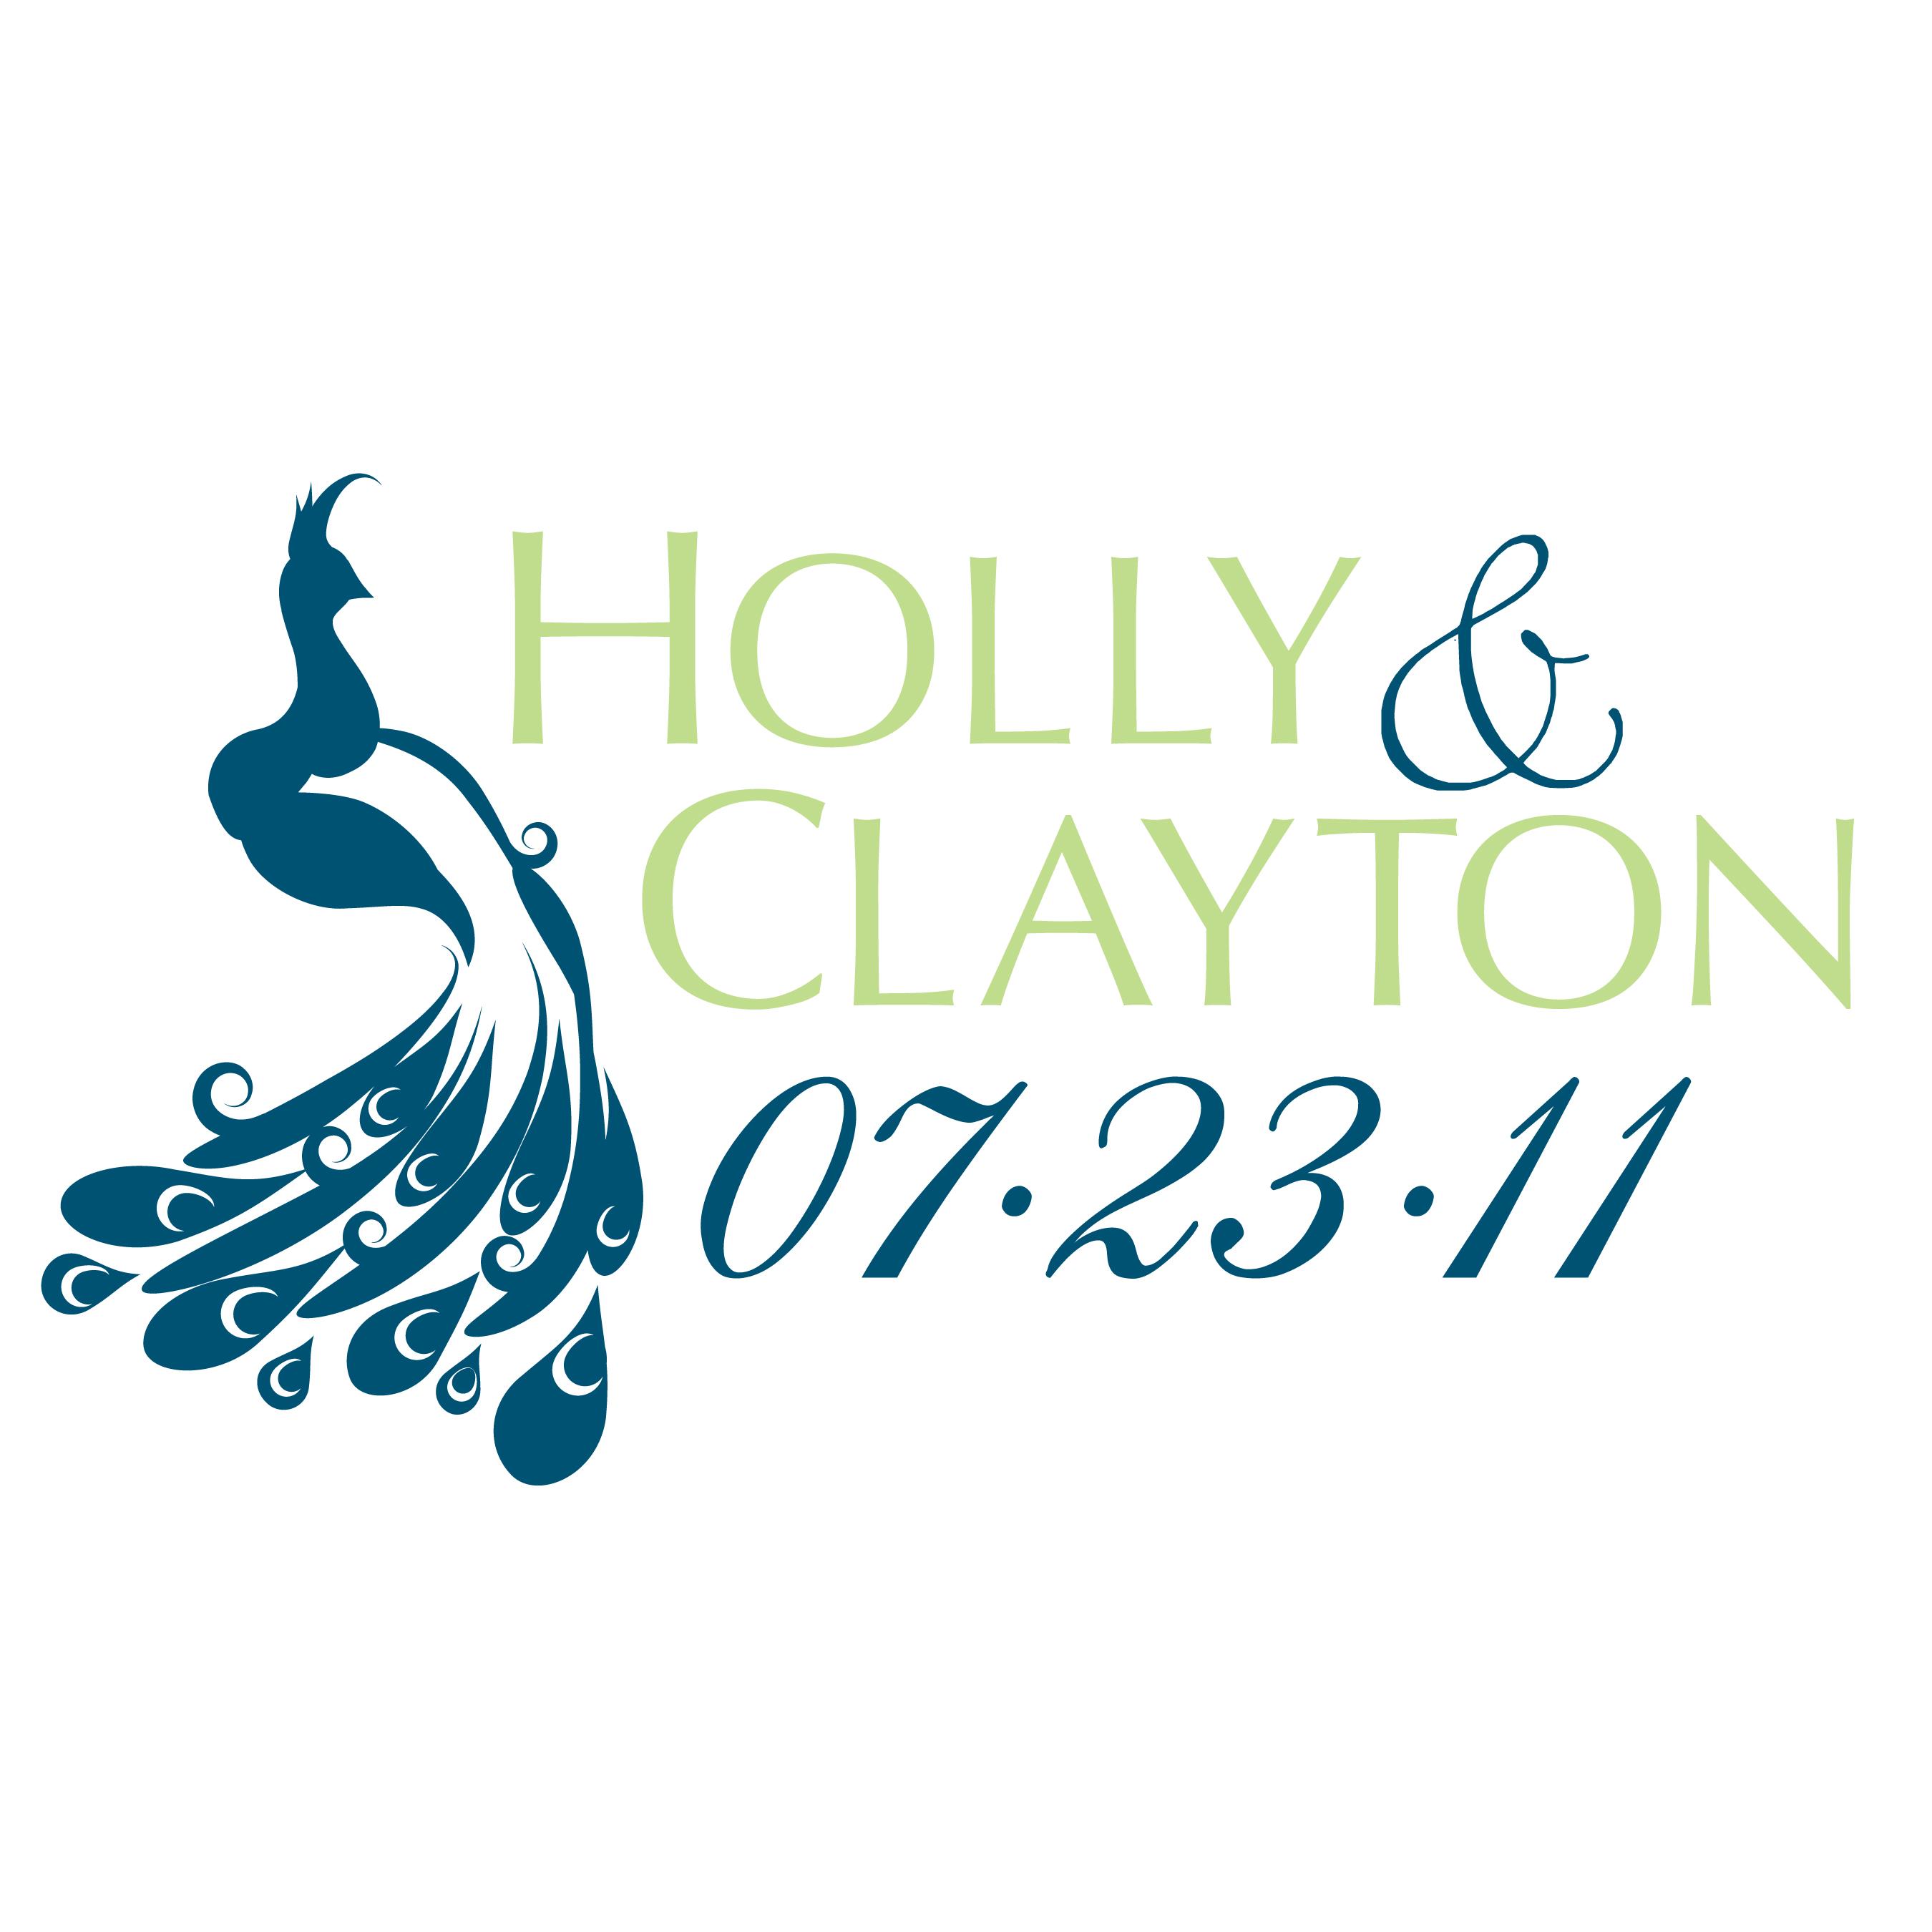 wedding logos rh logolynx com Bridal Shower Labels Wedding Shower Clip Art